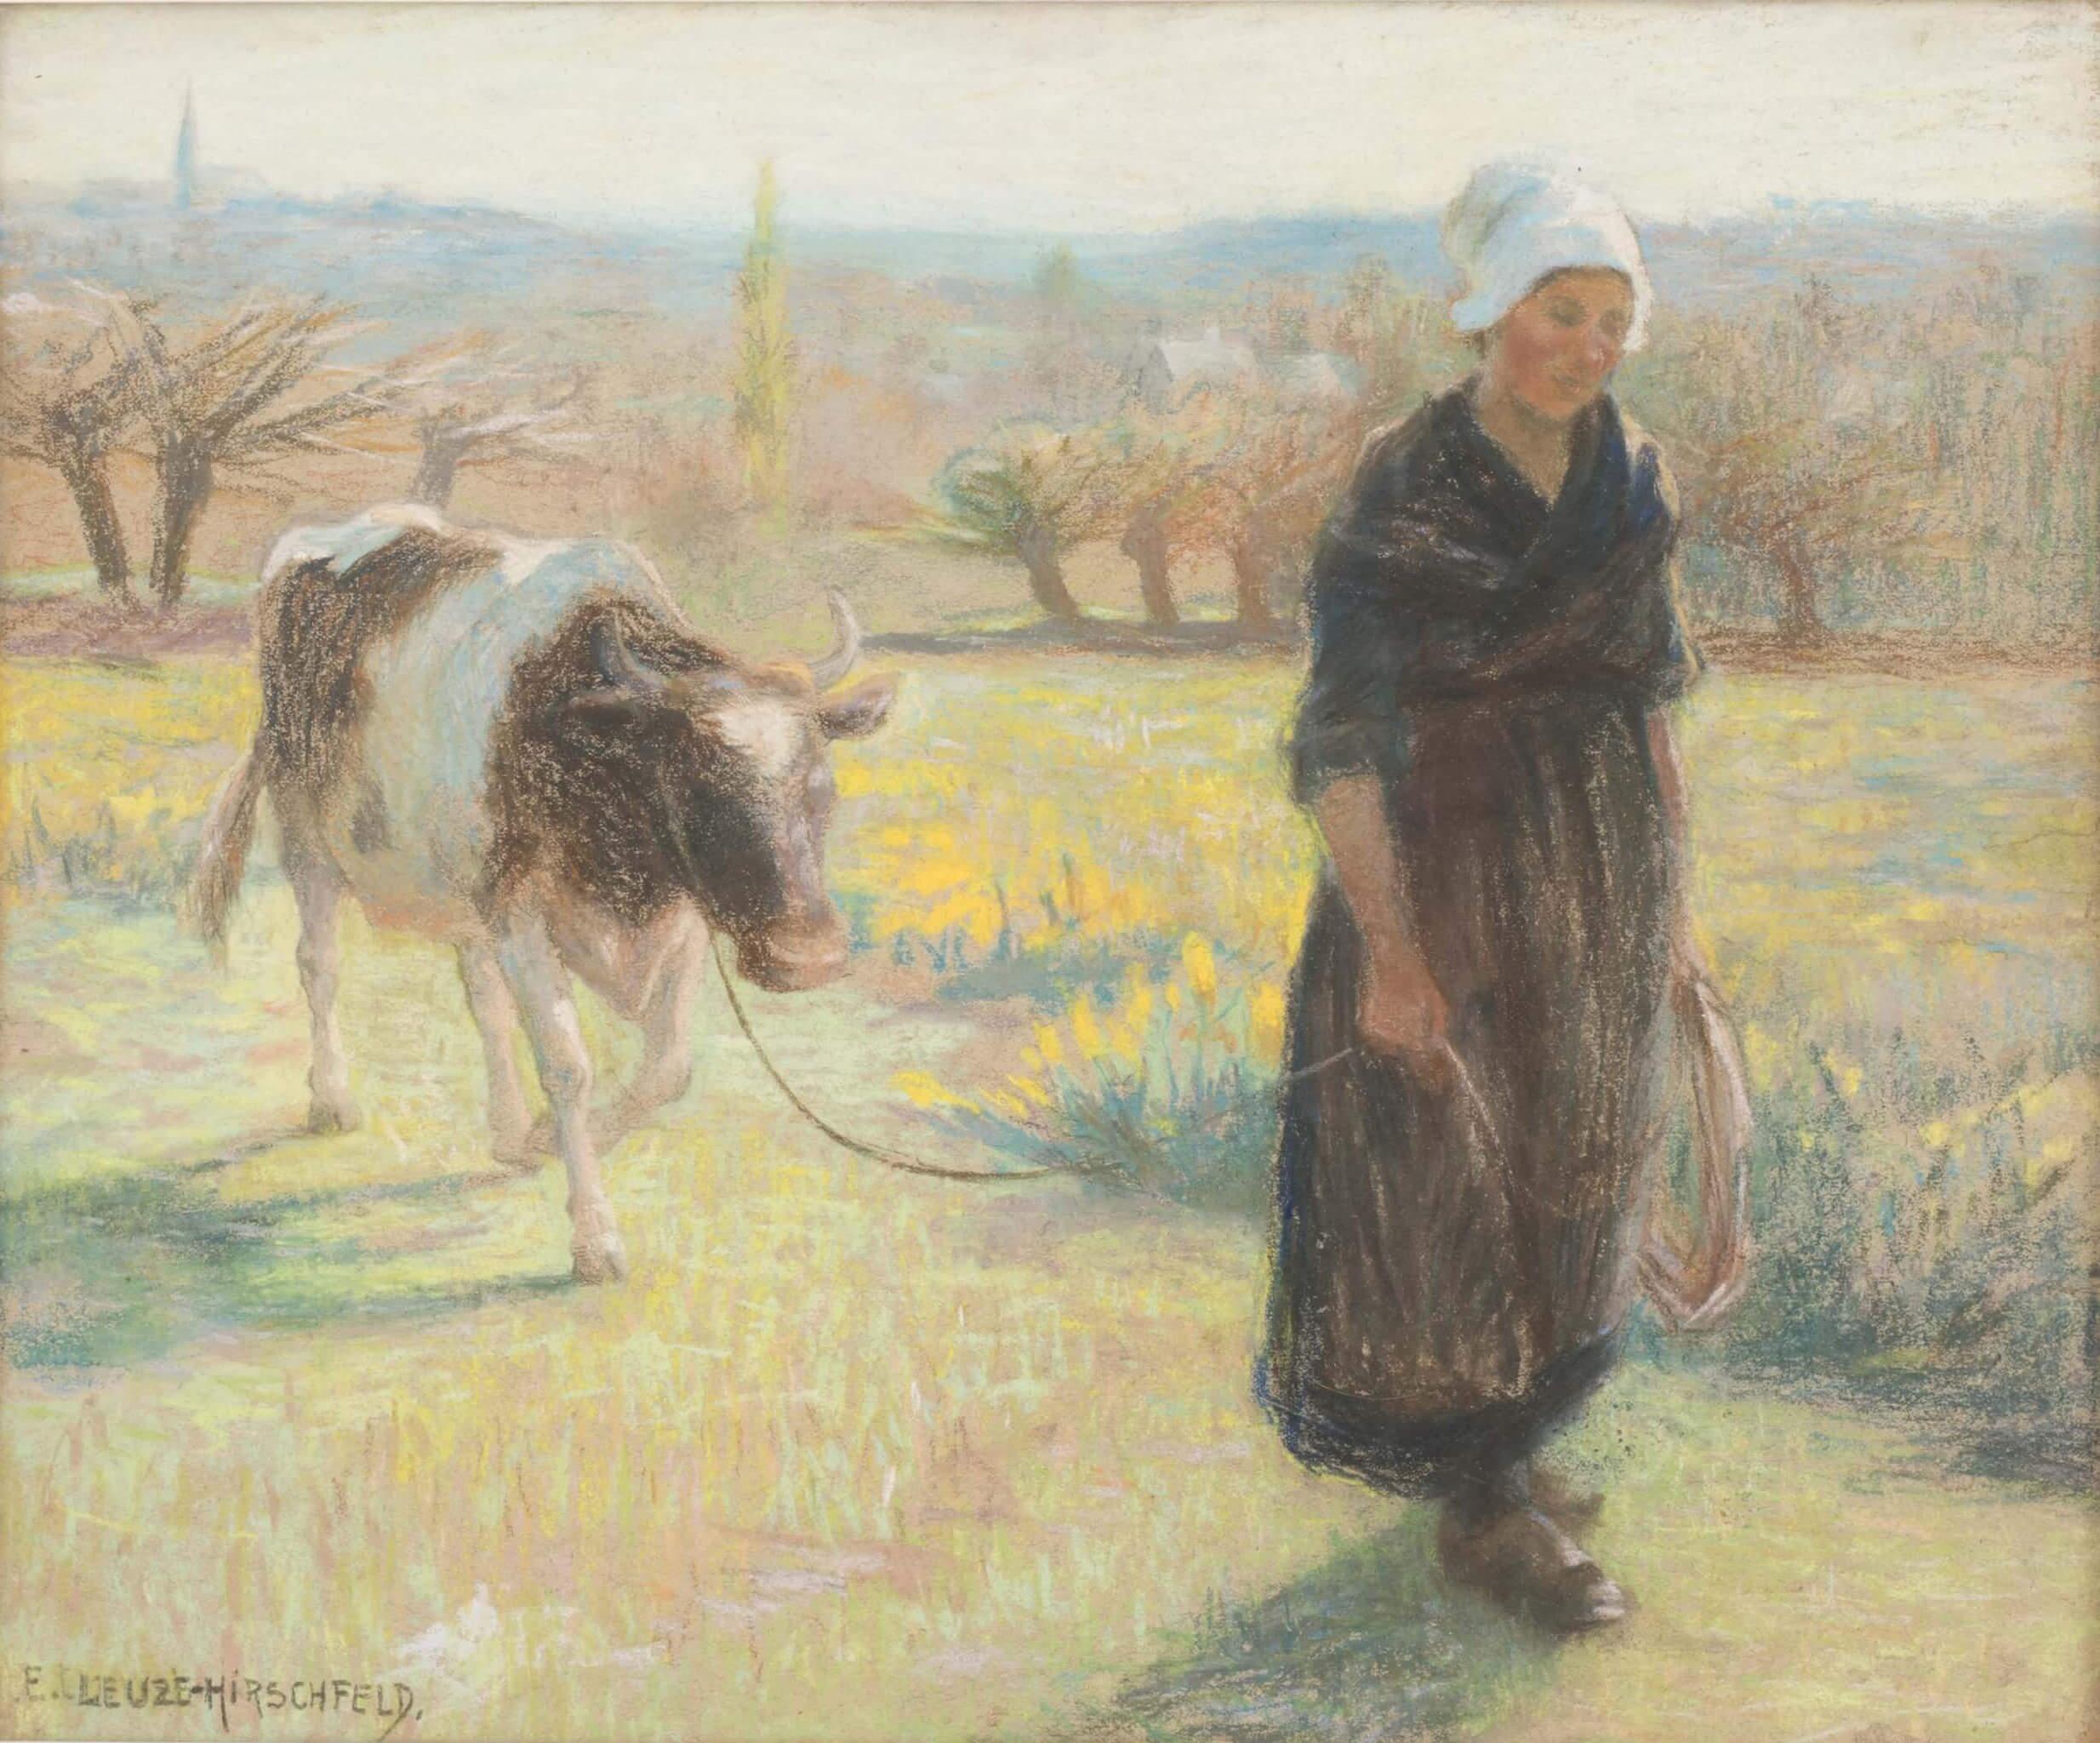 Emmy Leuze-Hirschfeld      The milkmaid     Price: £ 900